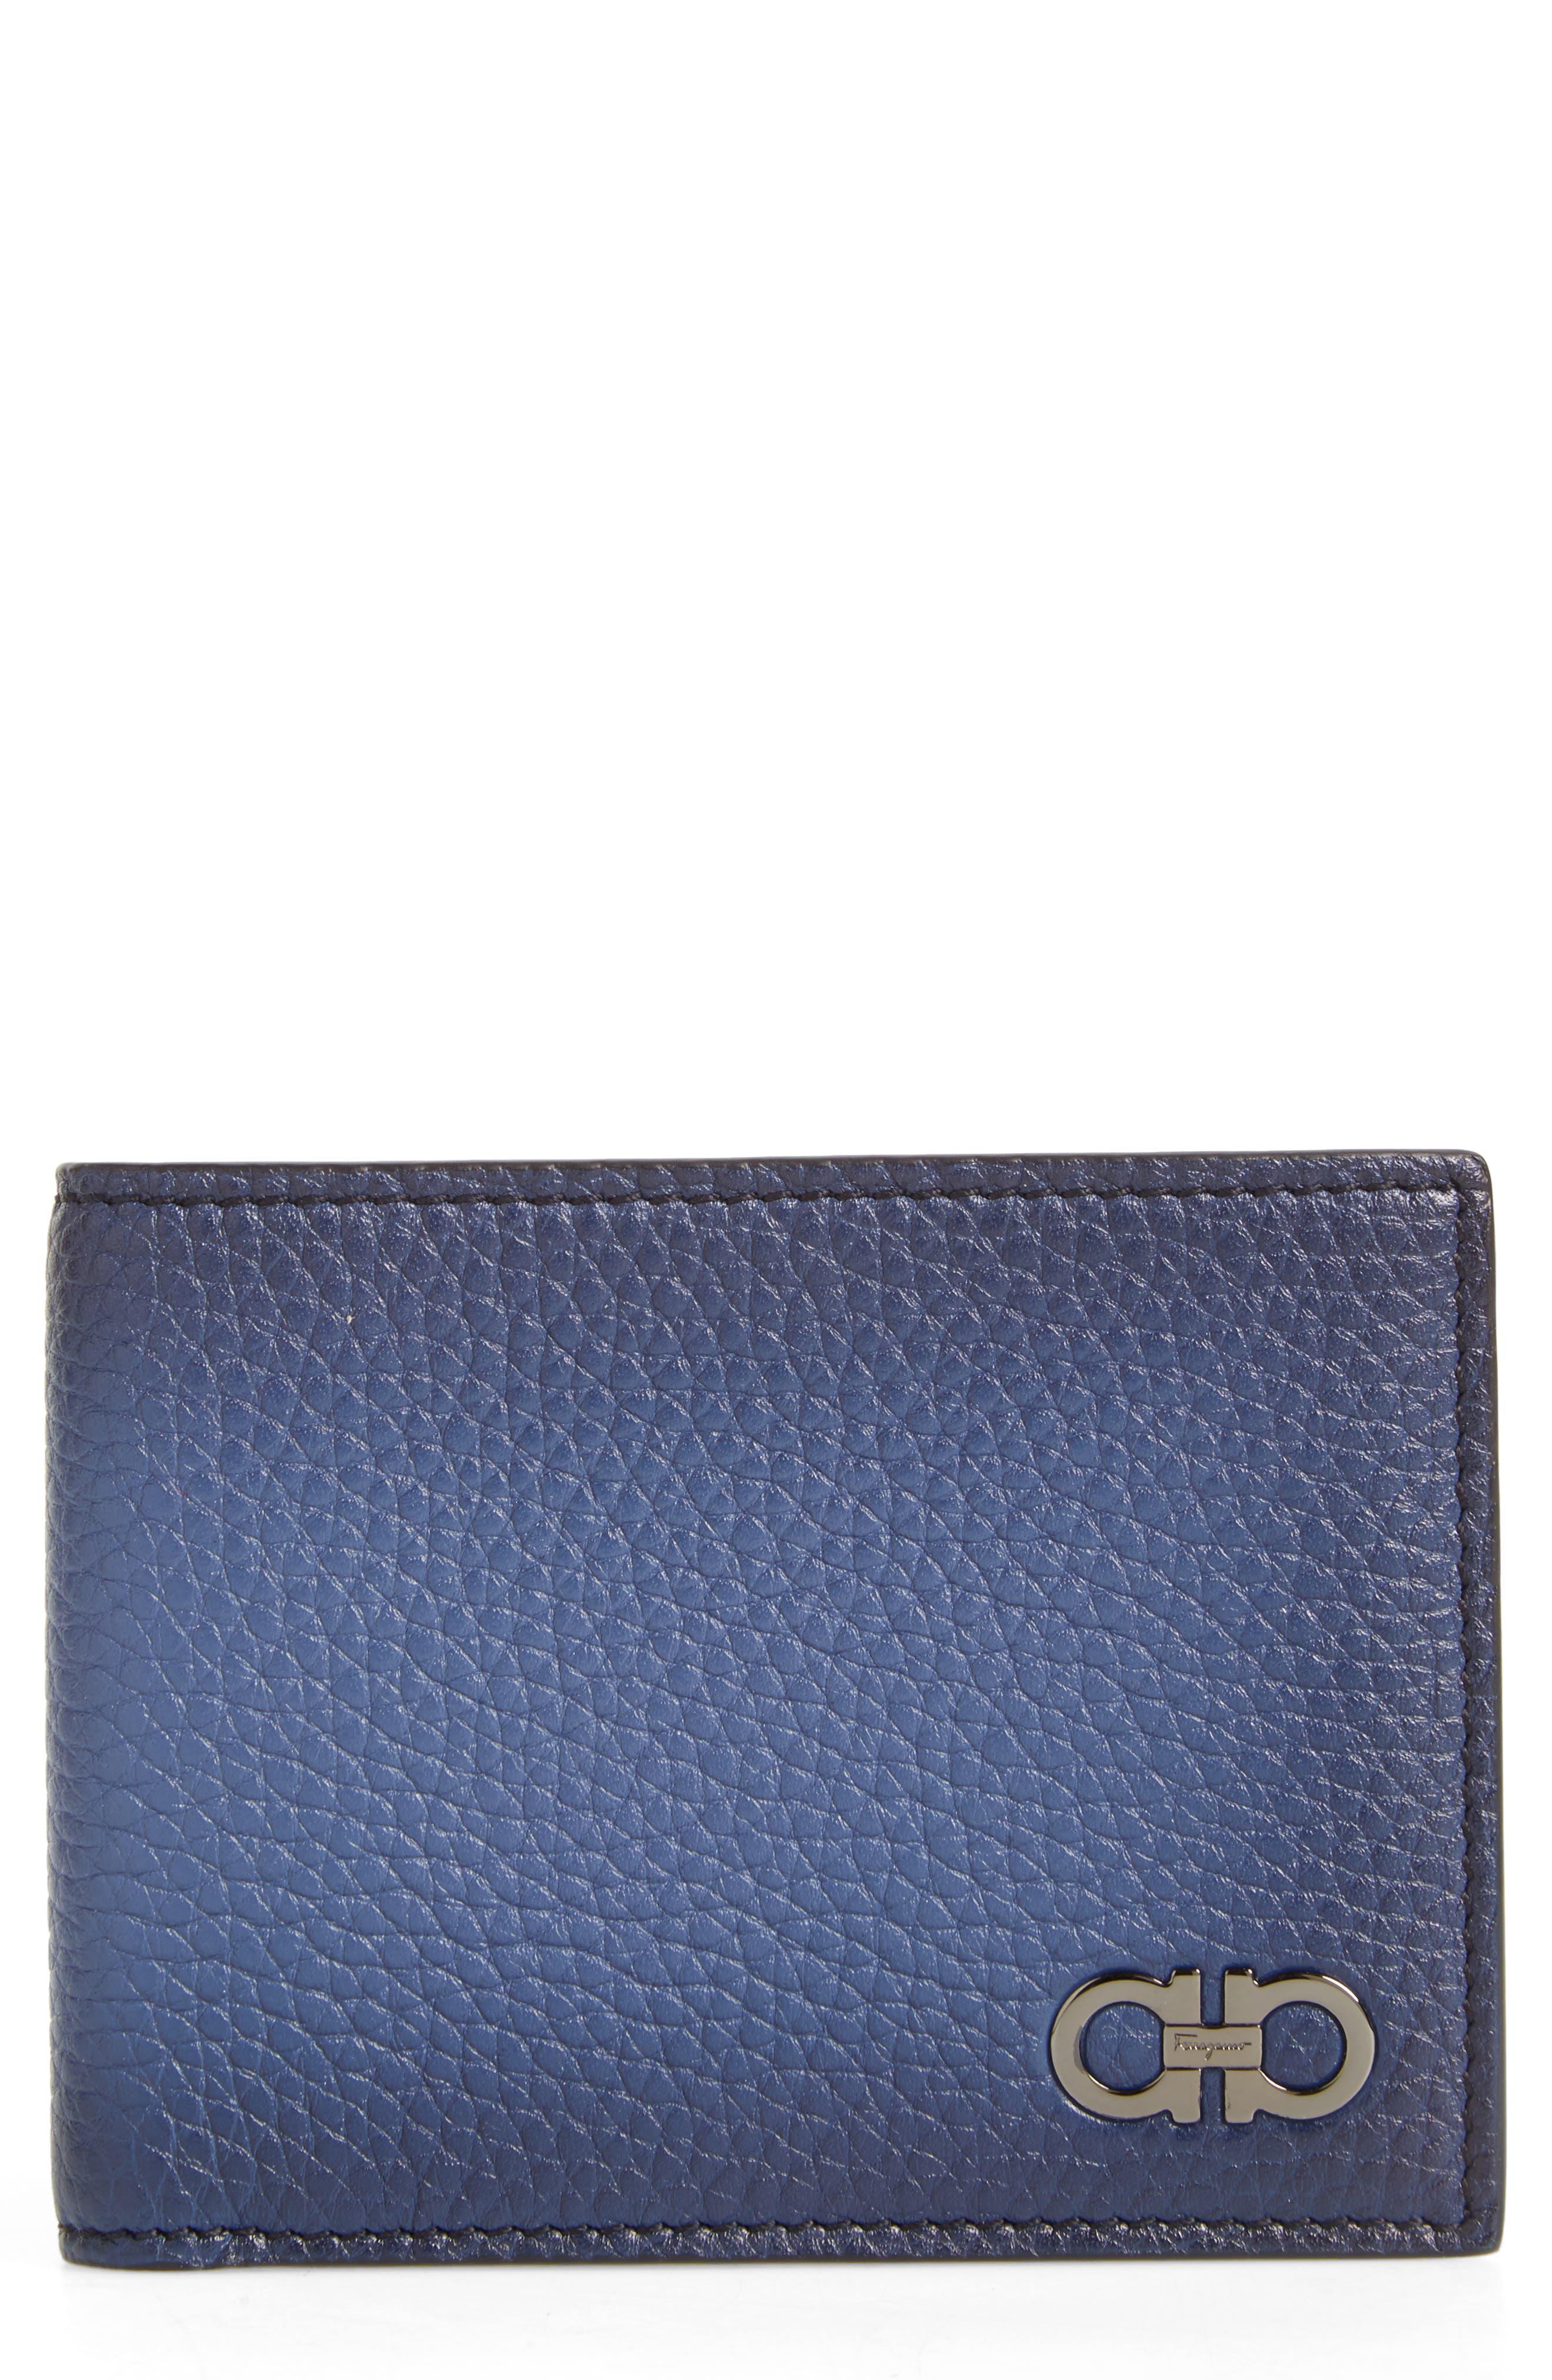 Firenze Glow Calfskin Leather Bifold Wallet,                             Main thumbnail 1, color,                             Blue